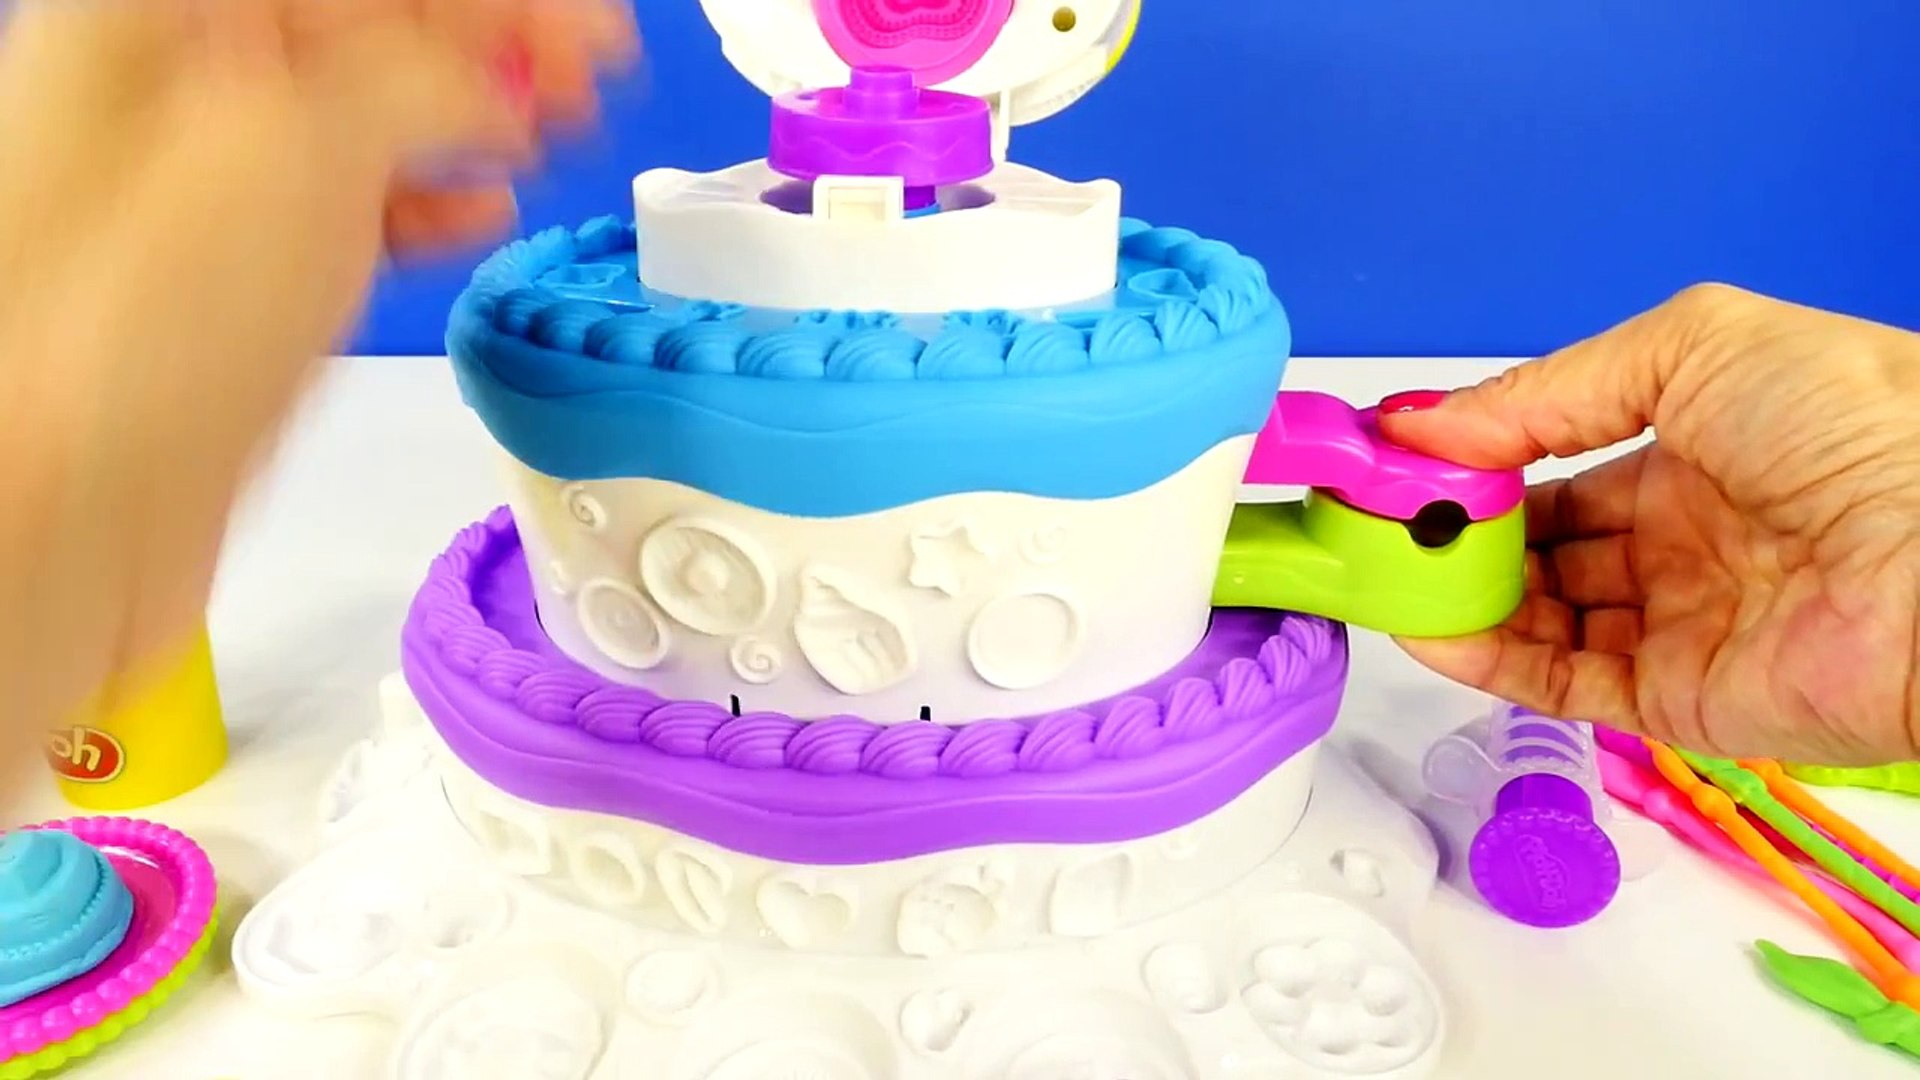 Pleasing Play Doh Birthday Cake Mountain 2 In 1 Sweet Shoppe Playdough Cake Personalised Birthday Cards Veneteletsinfo